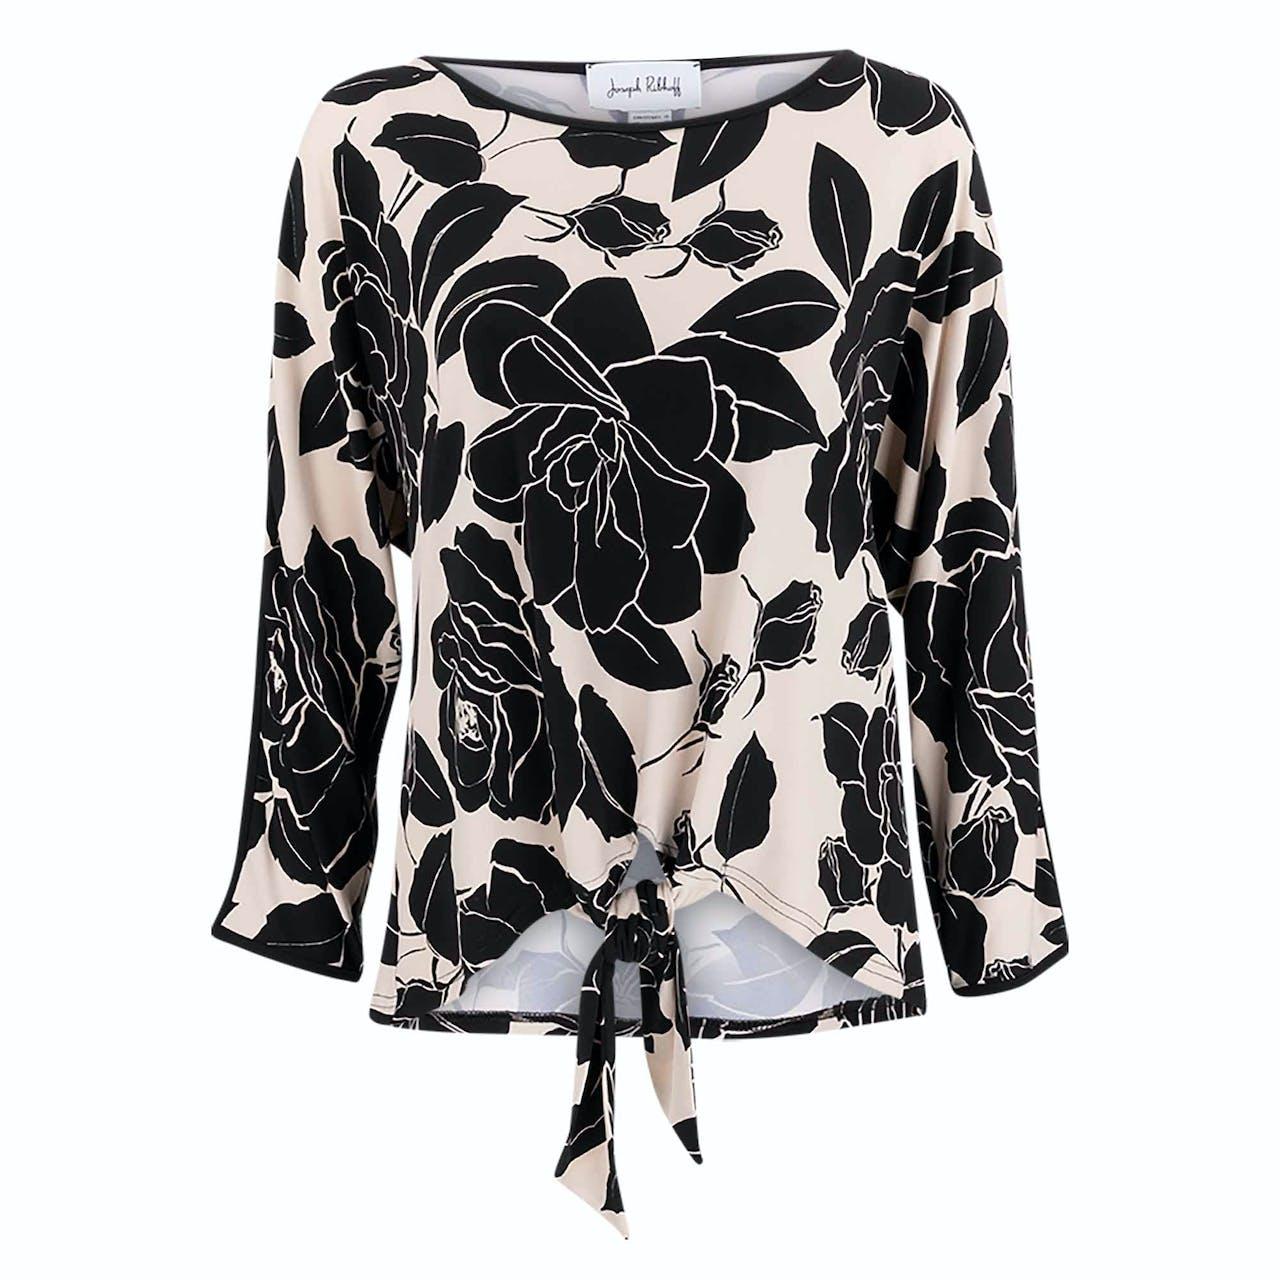 Shirt 1/1 Arm - Regular Fit - Allover Print